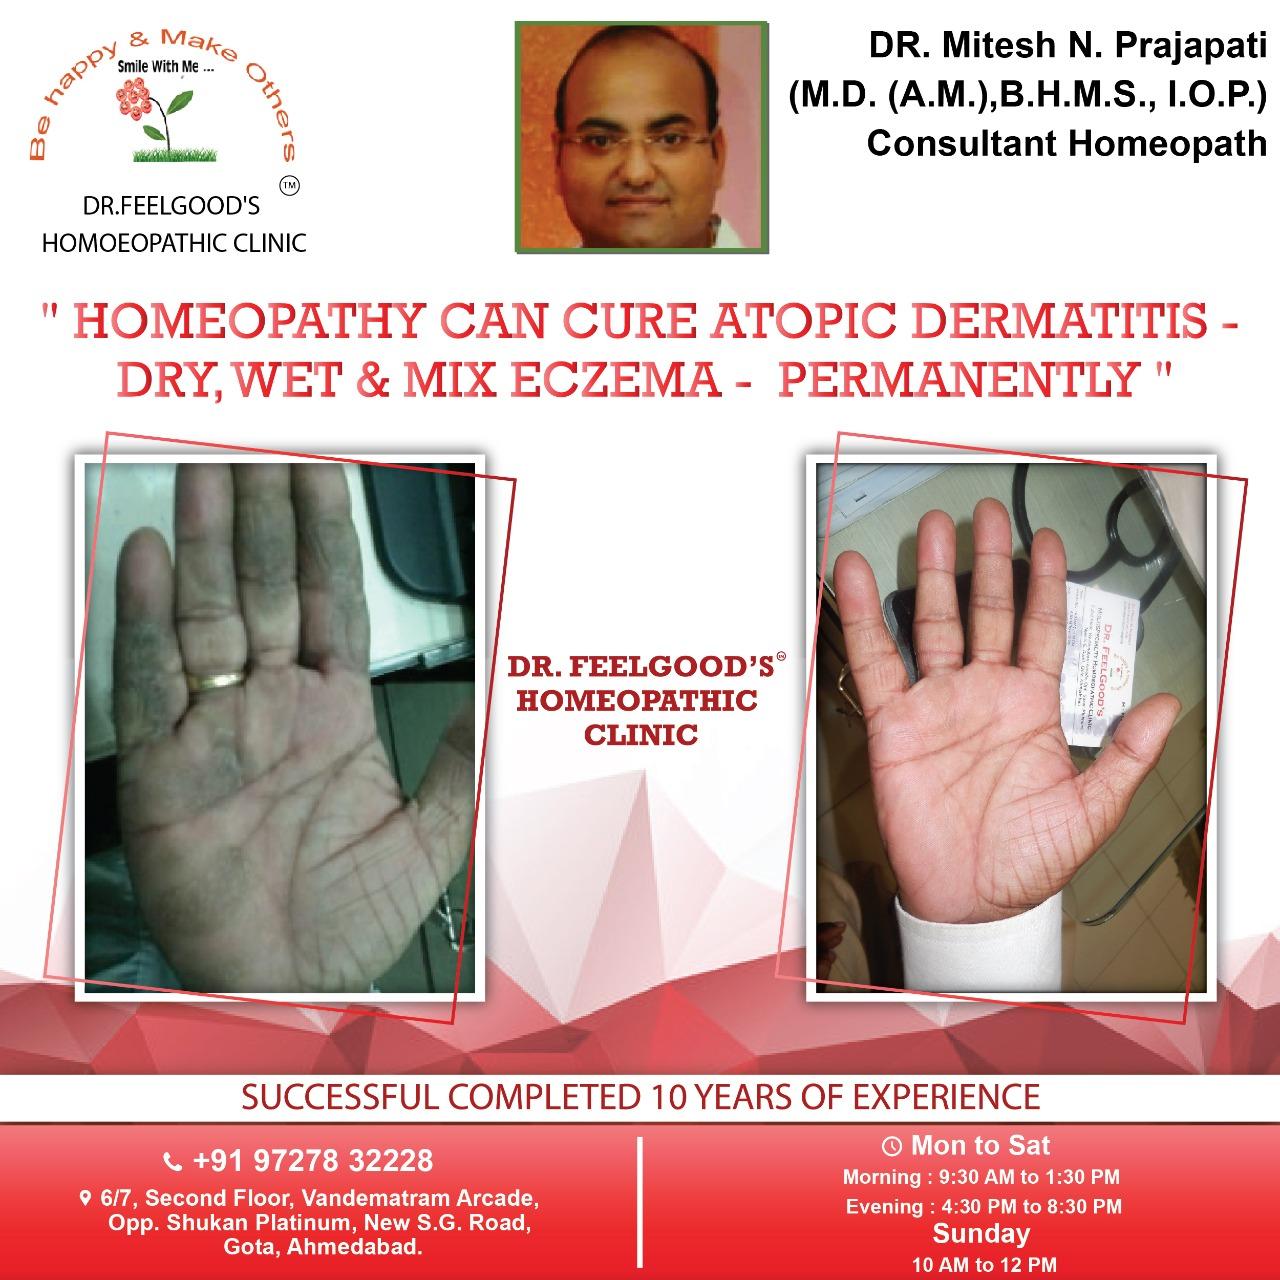 DR MITESH PRAJAPATI - HOMEOPATHY FOR ECZEMA (1)